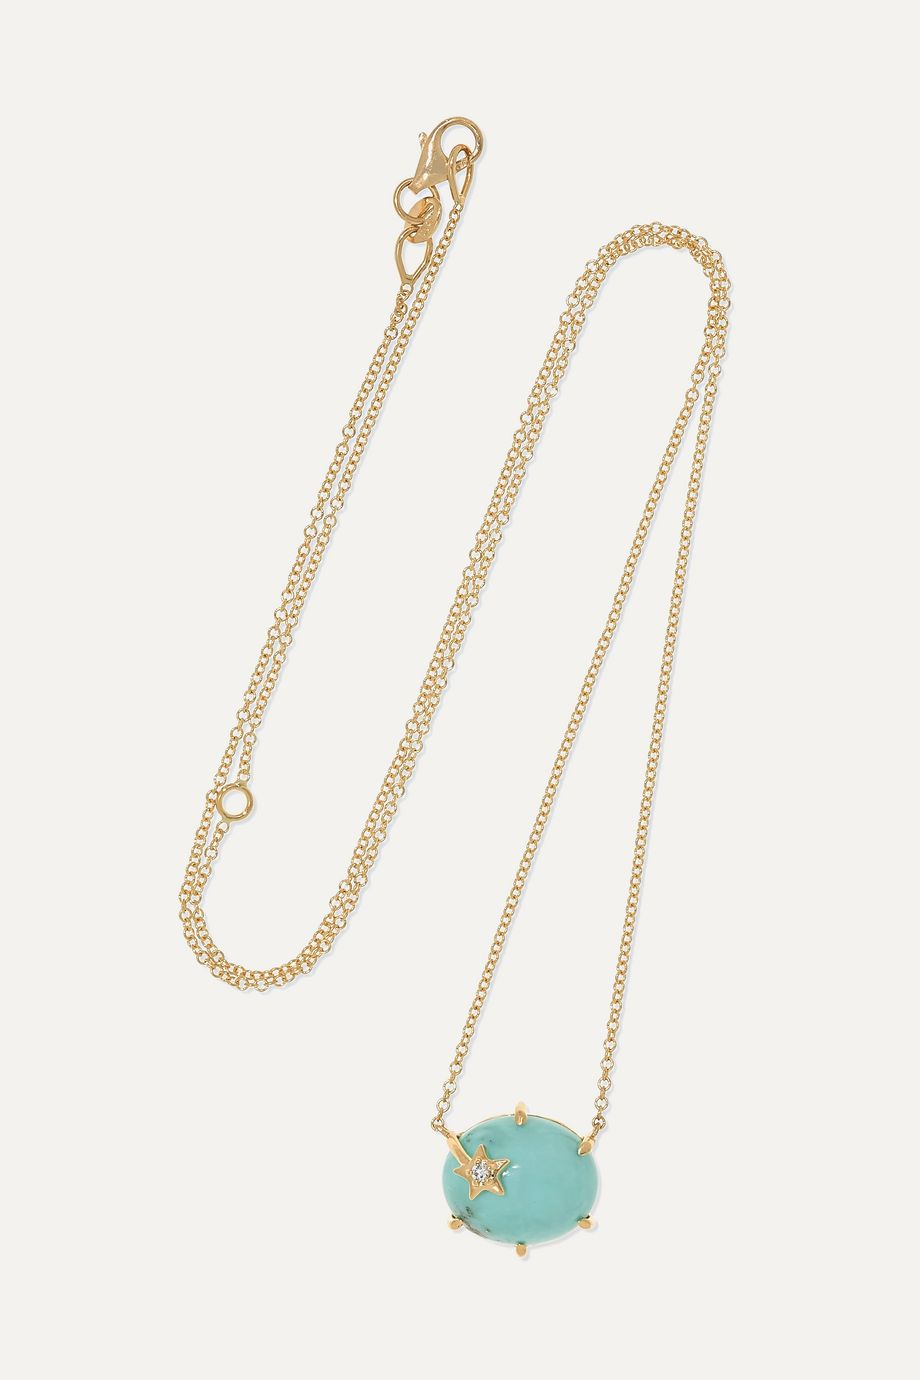 Andrea Fohrman Collier en or 18 carats, turquoise et diamant Mini Galaxy